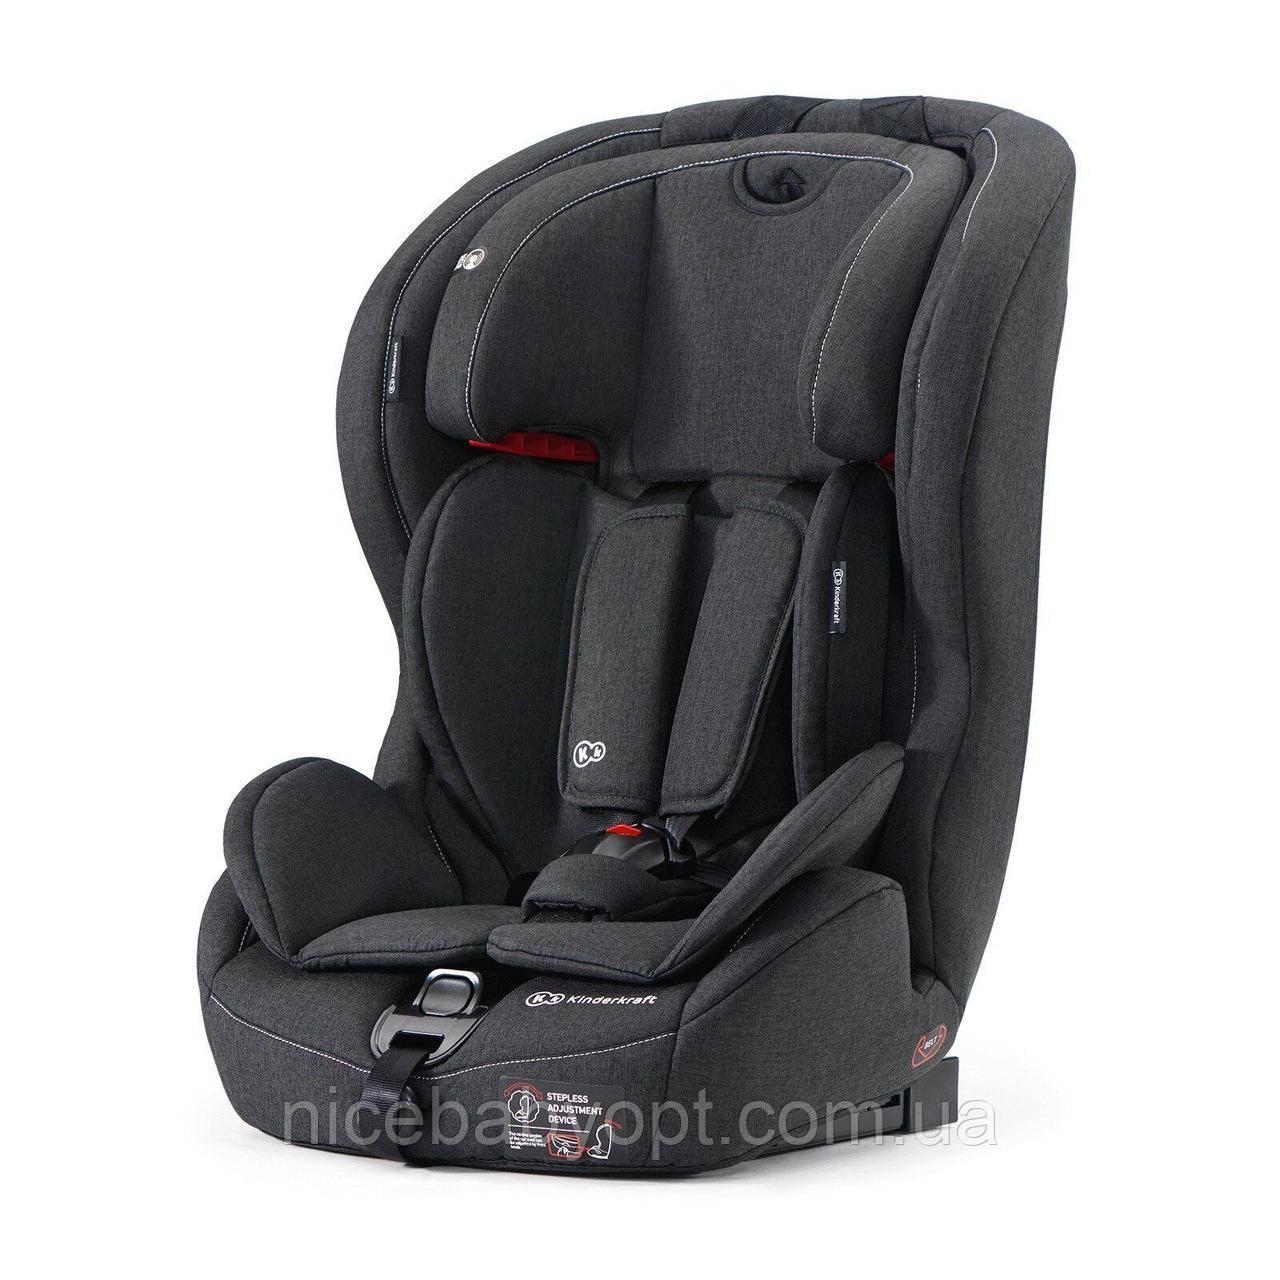 Автокресло Kinderkraft Safety Fix Black 9-36 кг (группа 1-2-3)